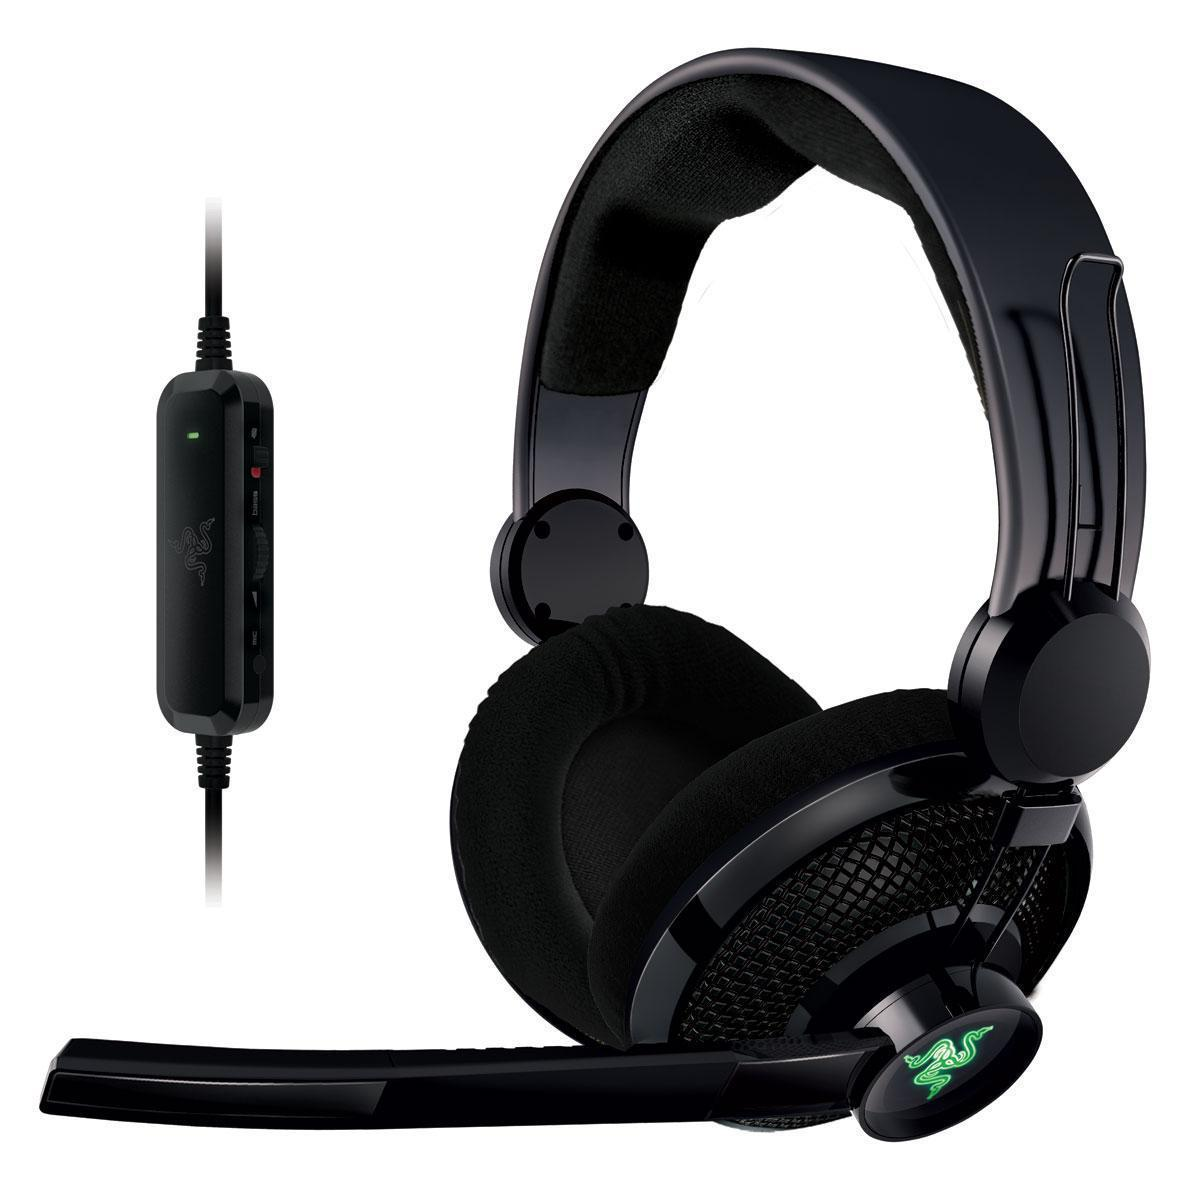 Casque Razer Carcharias - Pour Xbox 360/PC + Micro - Noir